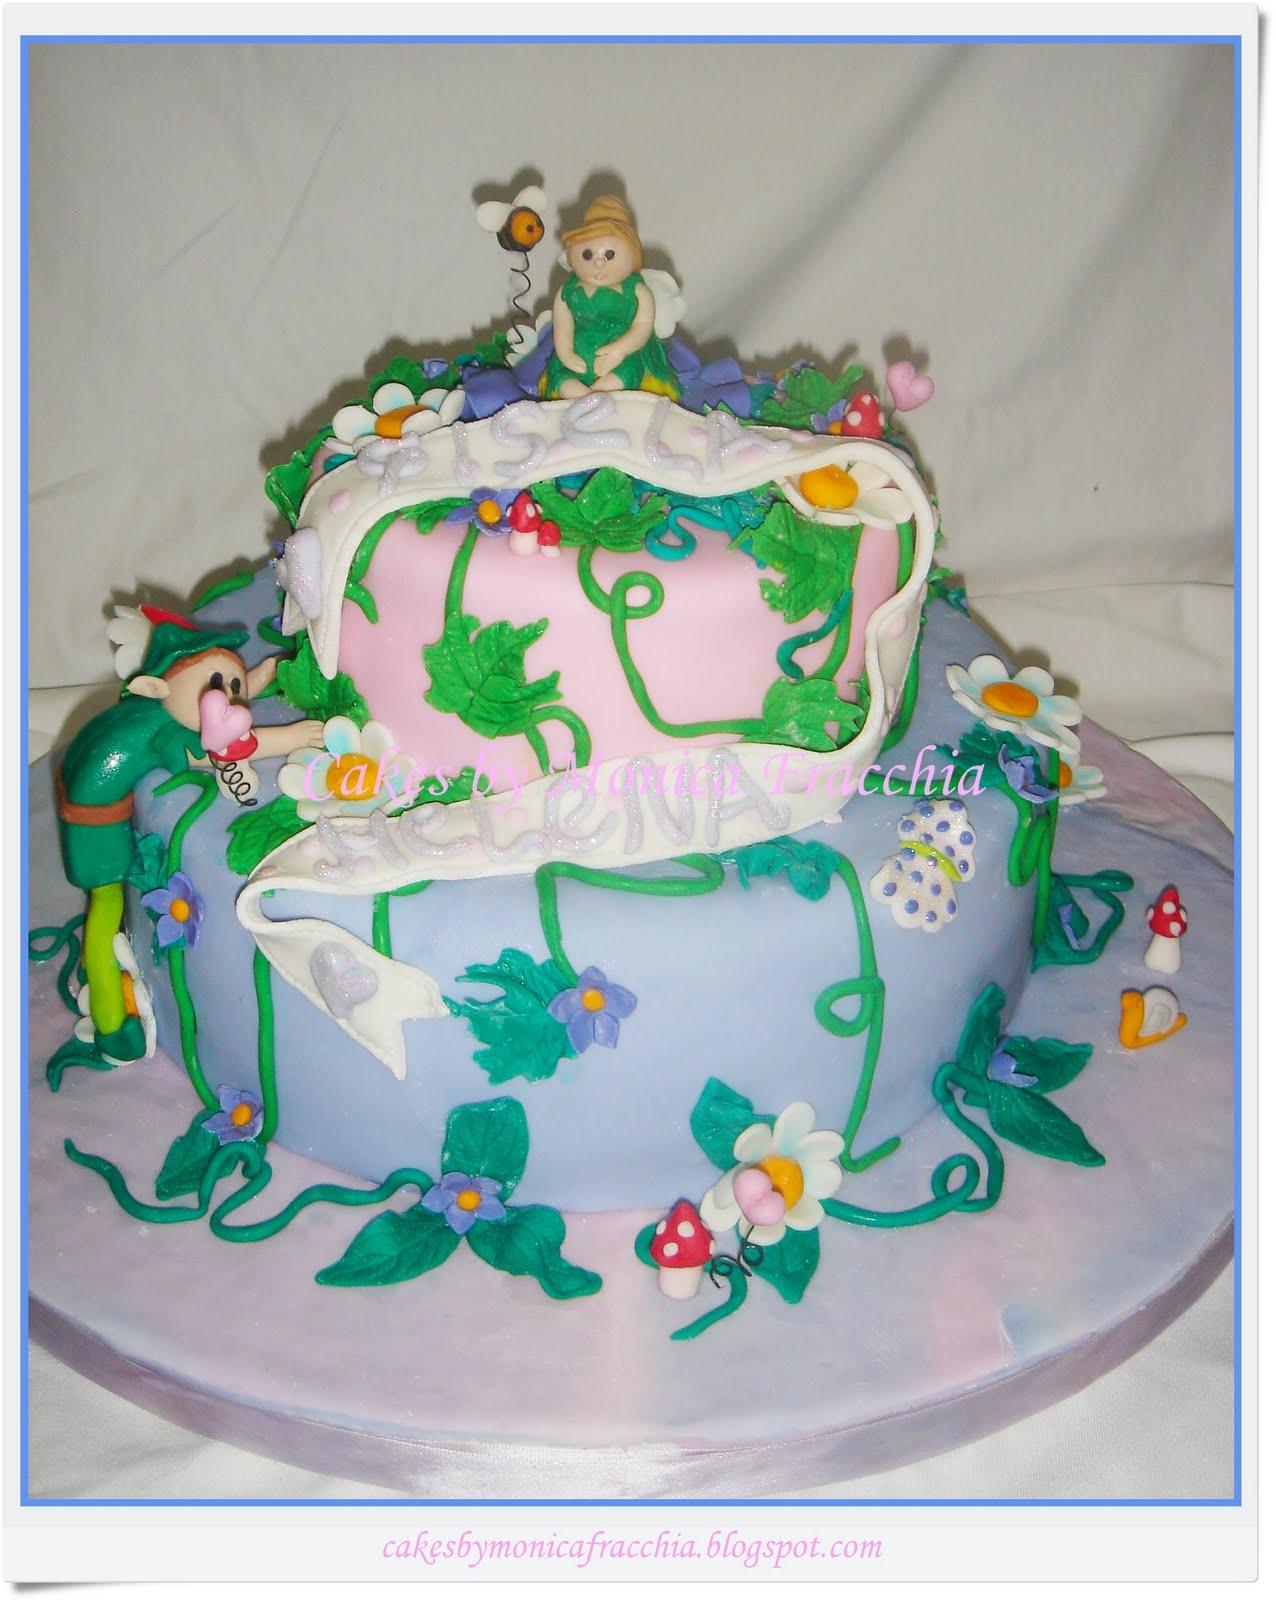 TORTA DECORADA DE CAMPANITA / TIMKERBELL CAKE | TORTAS CAKES BY ...